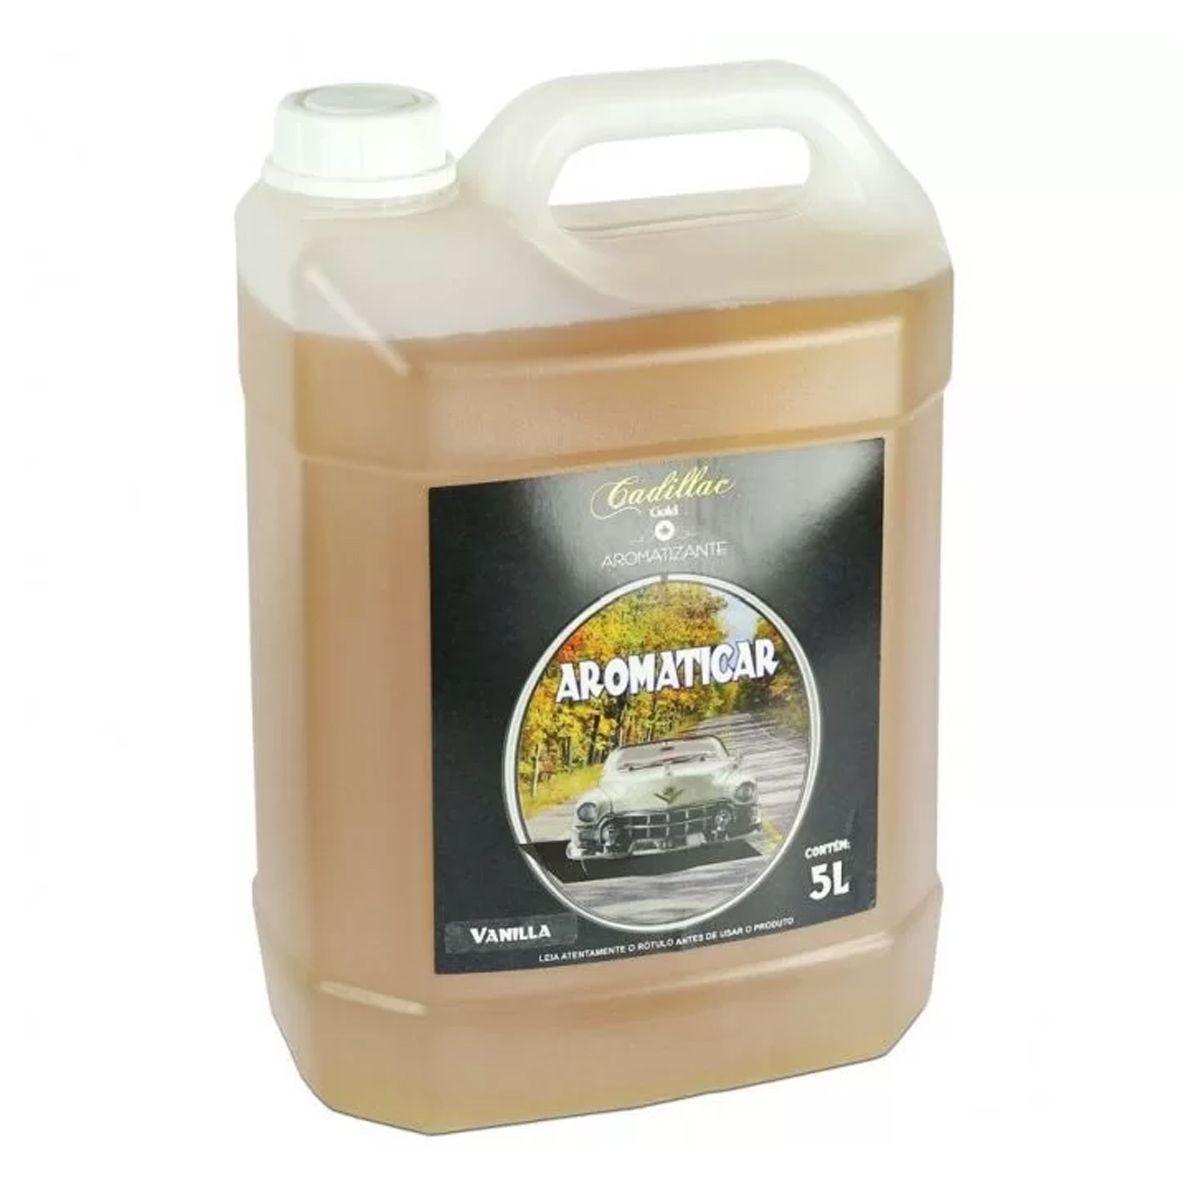 Aromatizante Vanilla - Aromaticar 5 Litros Cadillac